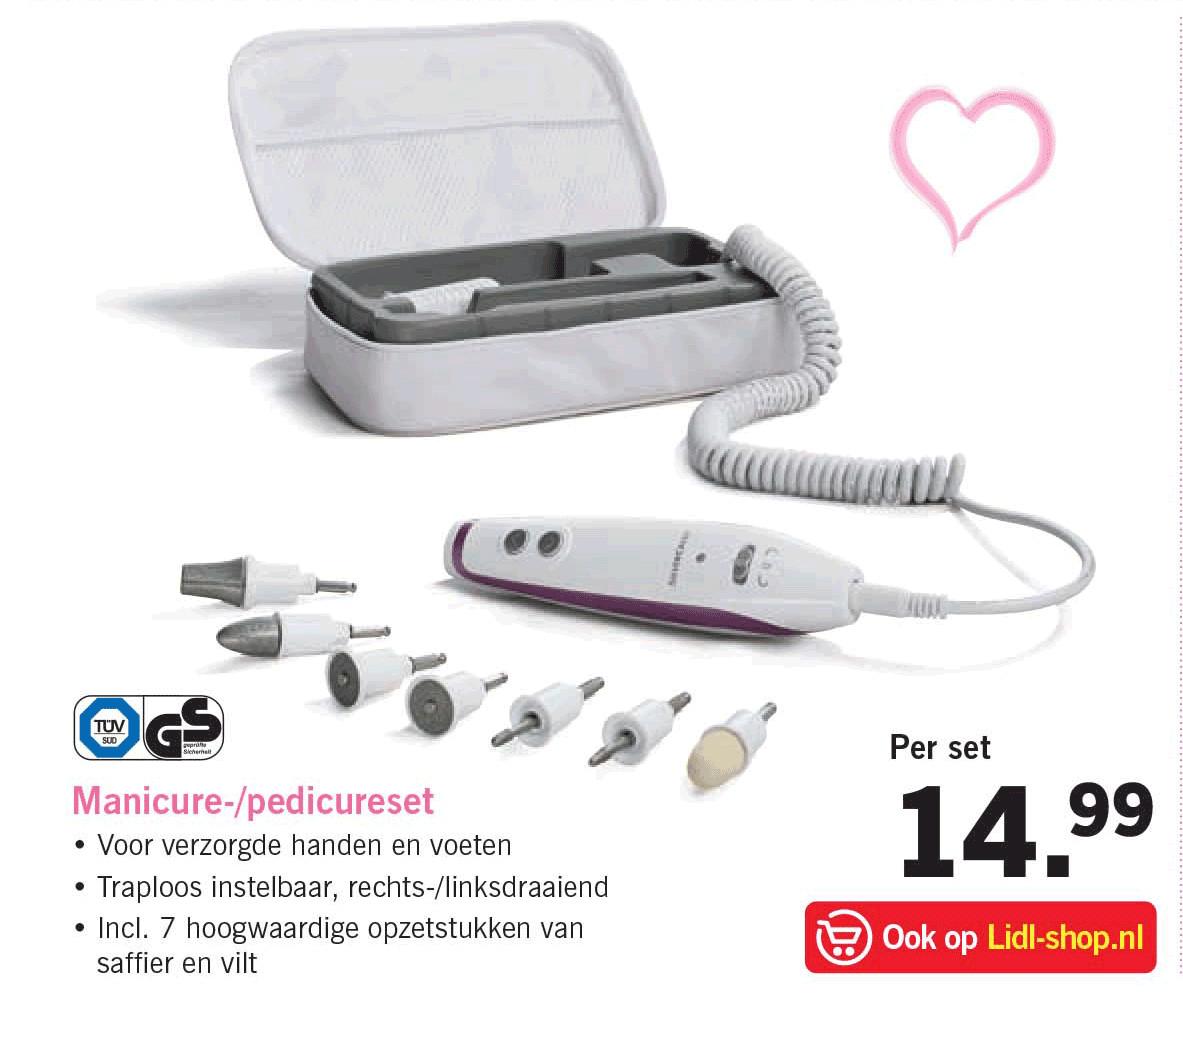 Maniküre Set Elektrisch Aldi  Lidl Folder Aanbiedingen